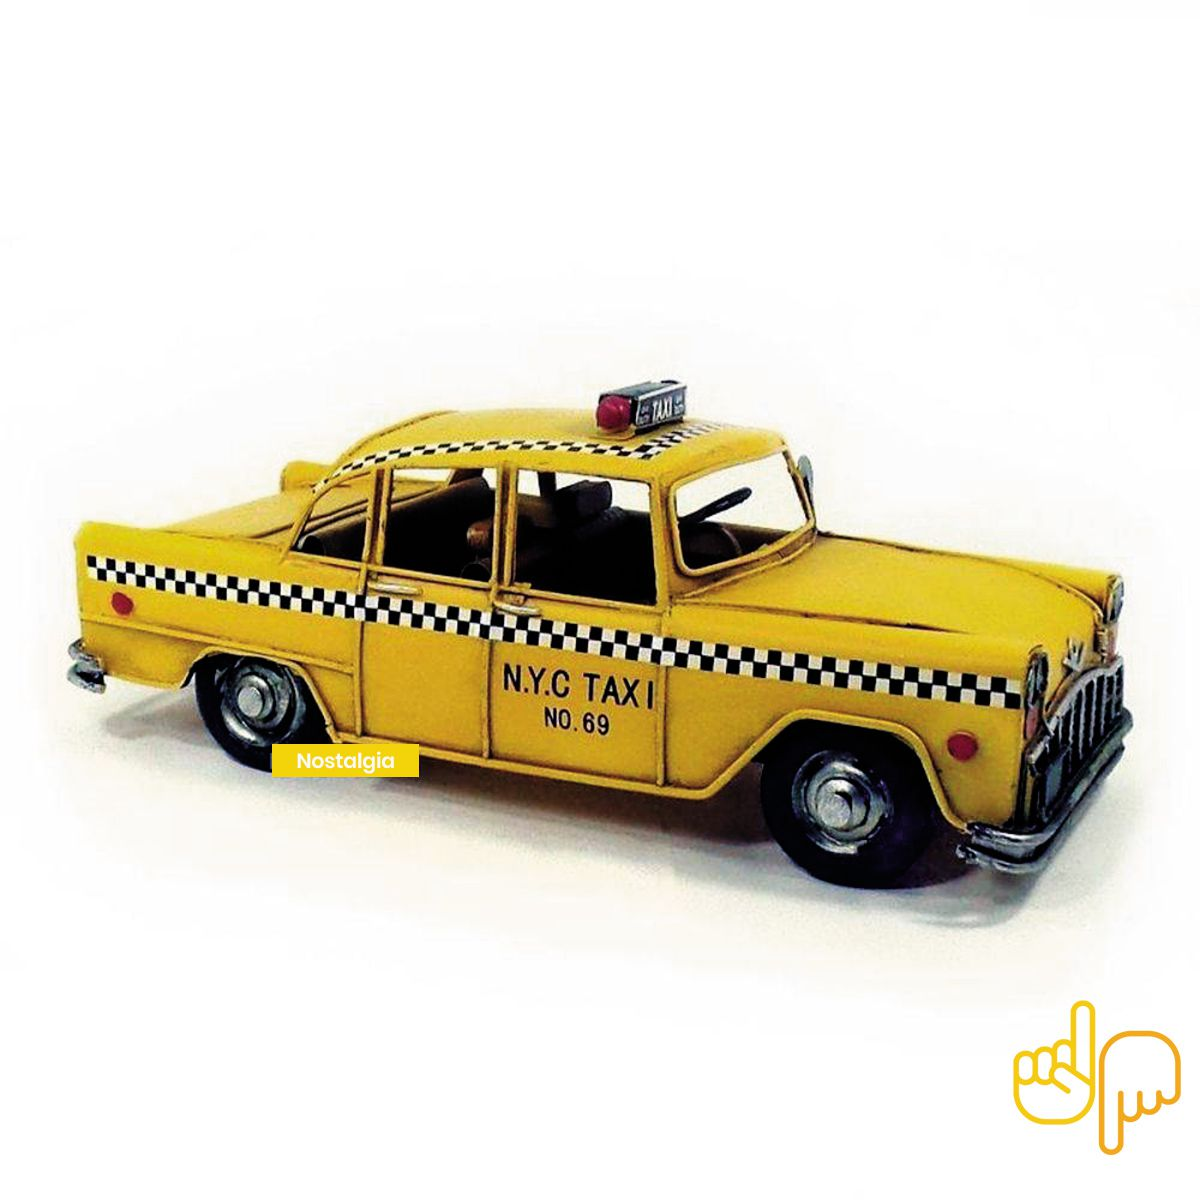 Carro de Metal Pura Nostalgia Taxi Nova York N.Y.C 69